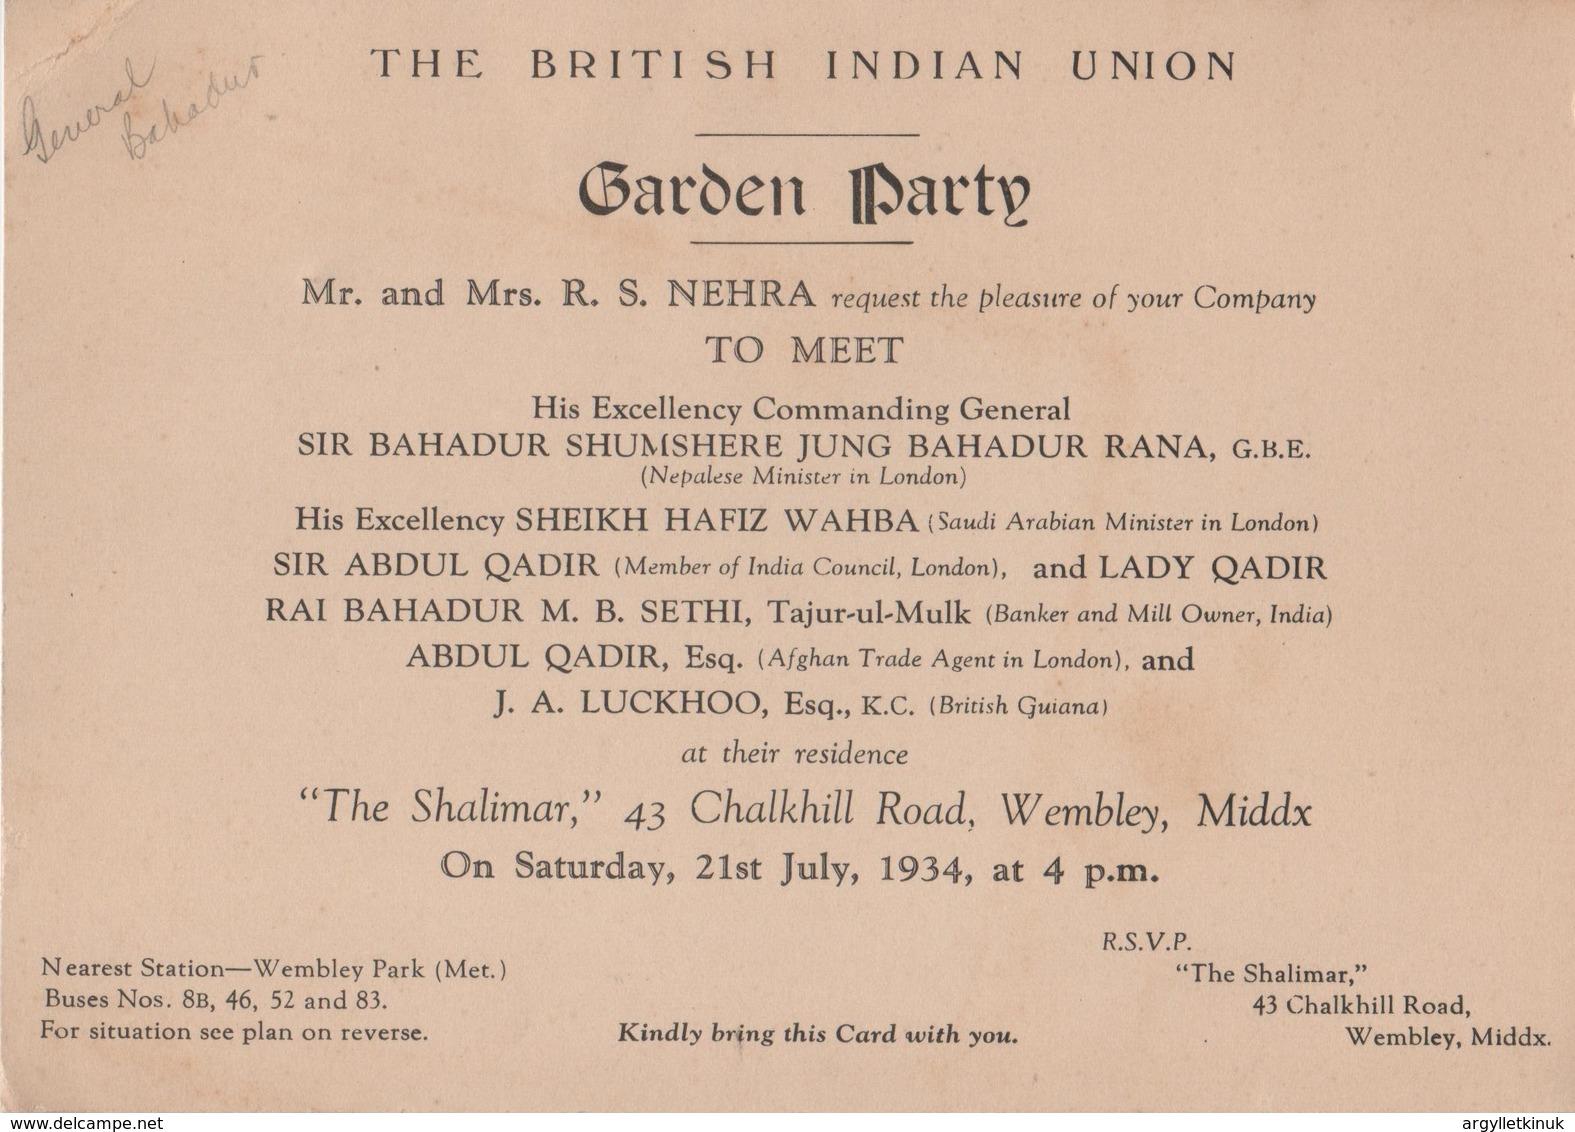 BRITISH INDIAN UNION NEPAL SAUDI ARABIA AFGHANISTAN 1934 WEMBLEY - Tickets - Vouchers